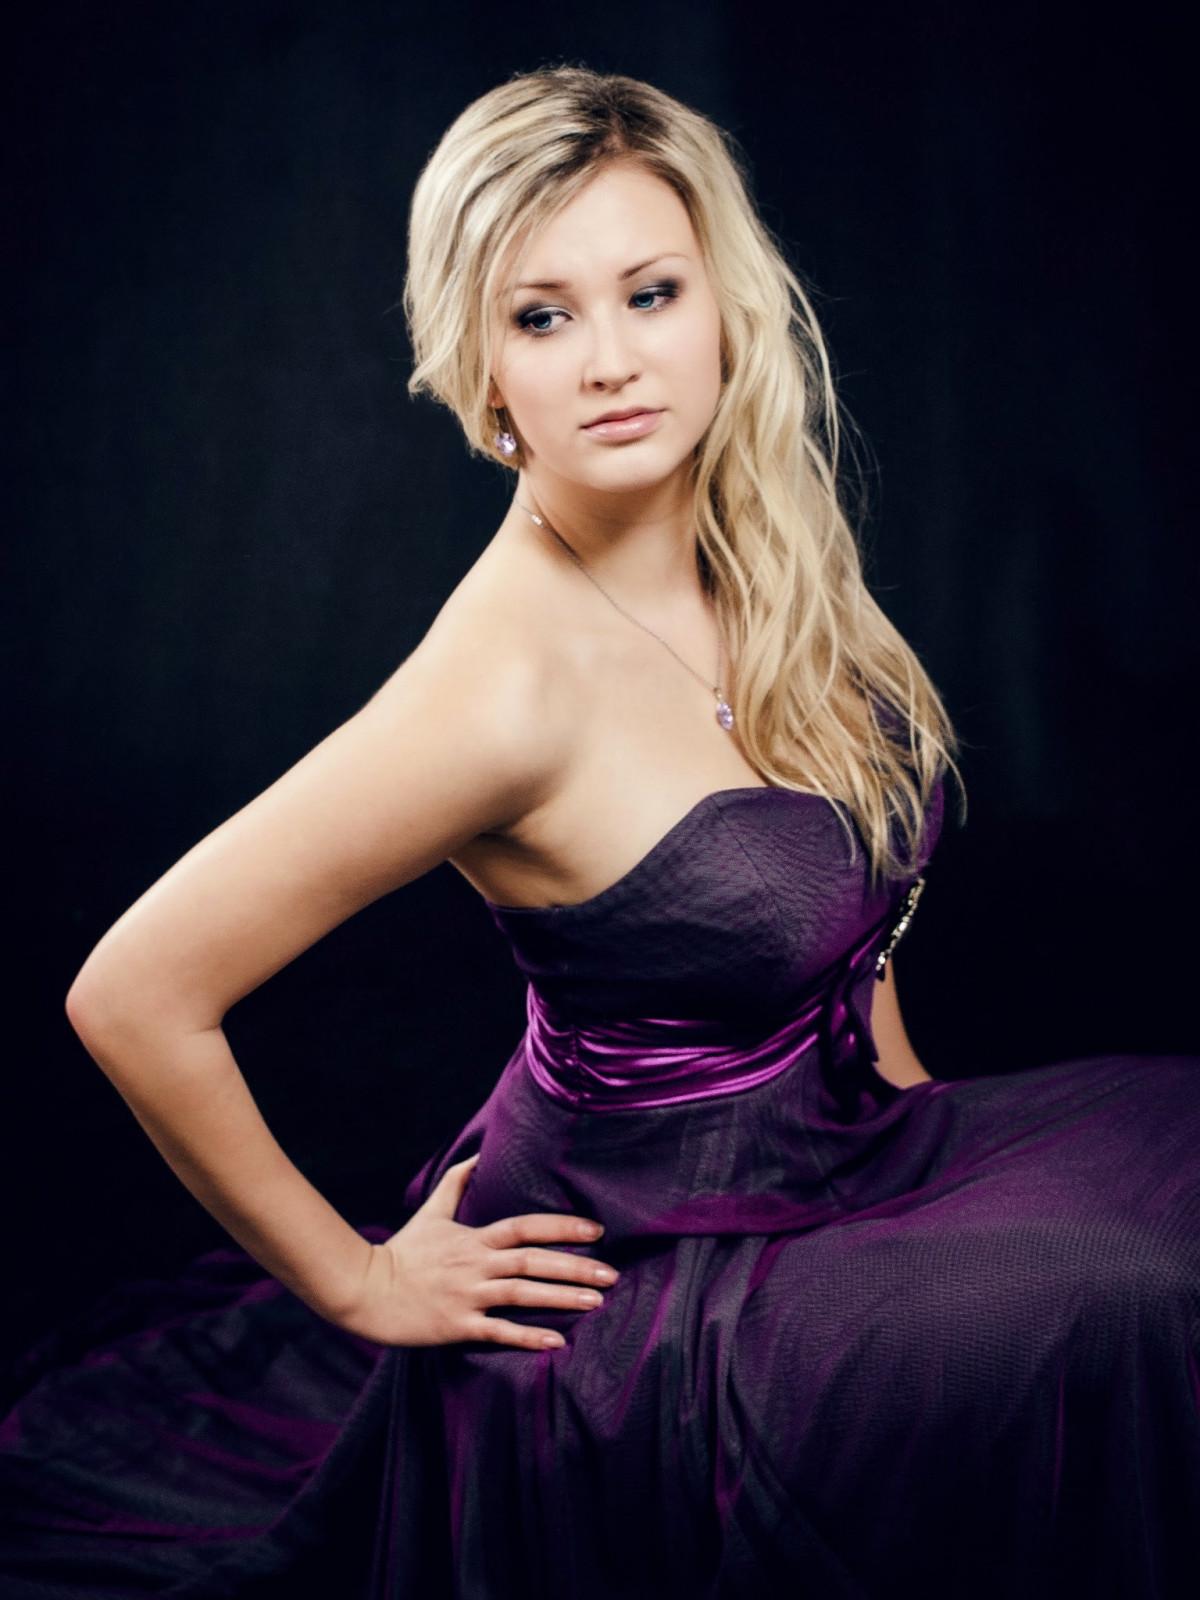 Free Images Person Girl Woman Dark Singer Fashion